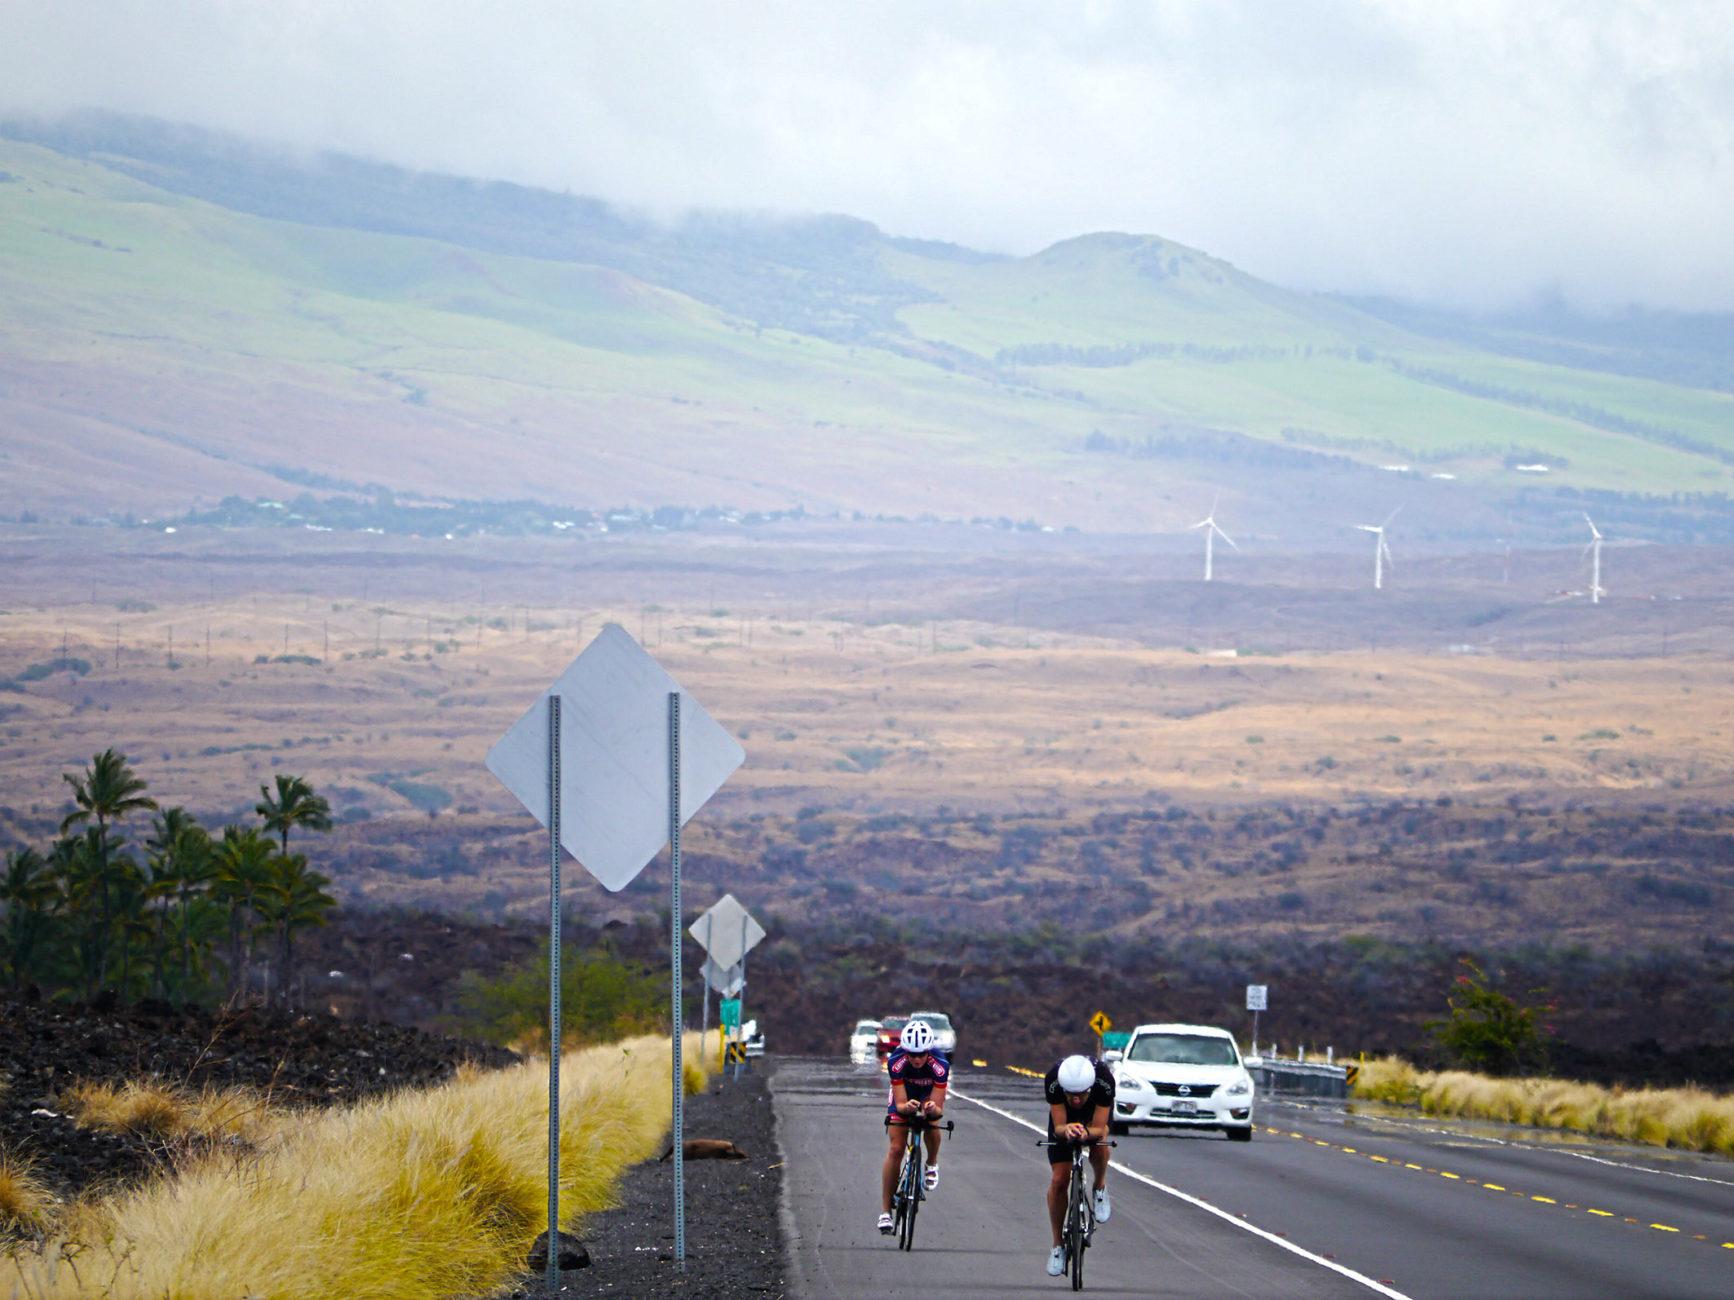 IRONMAN Hawaii 2016 – Training Auf Dem Highway